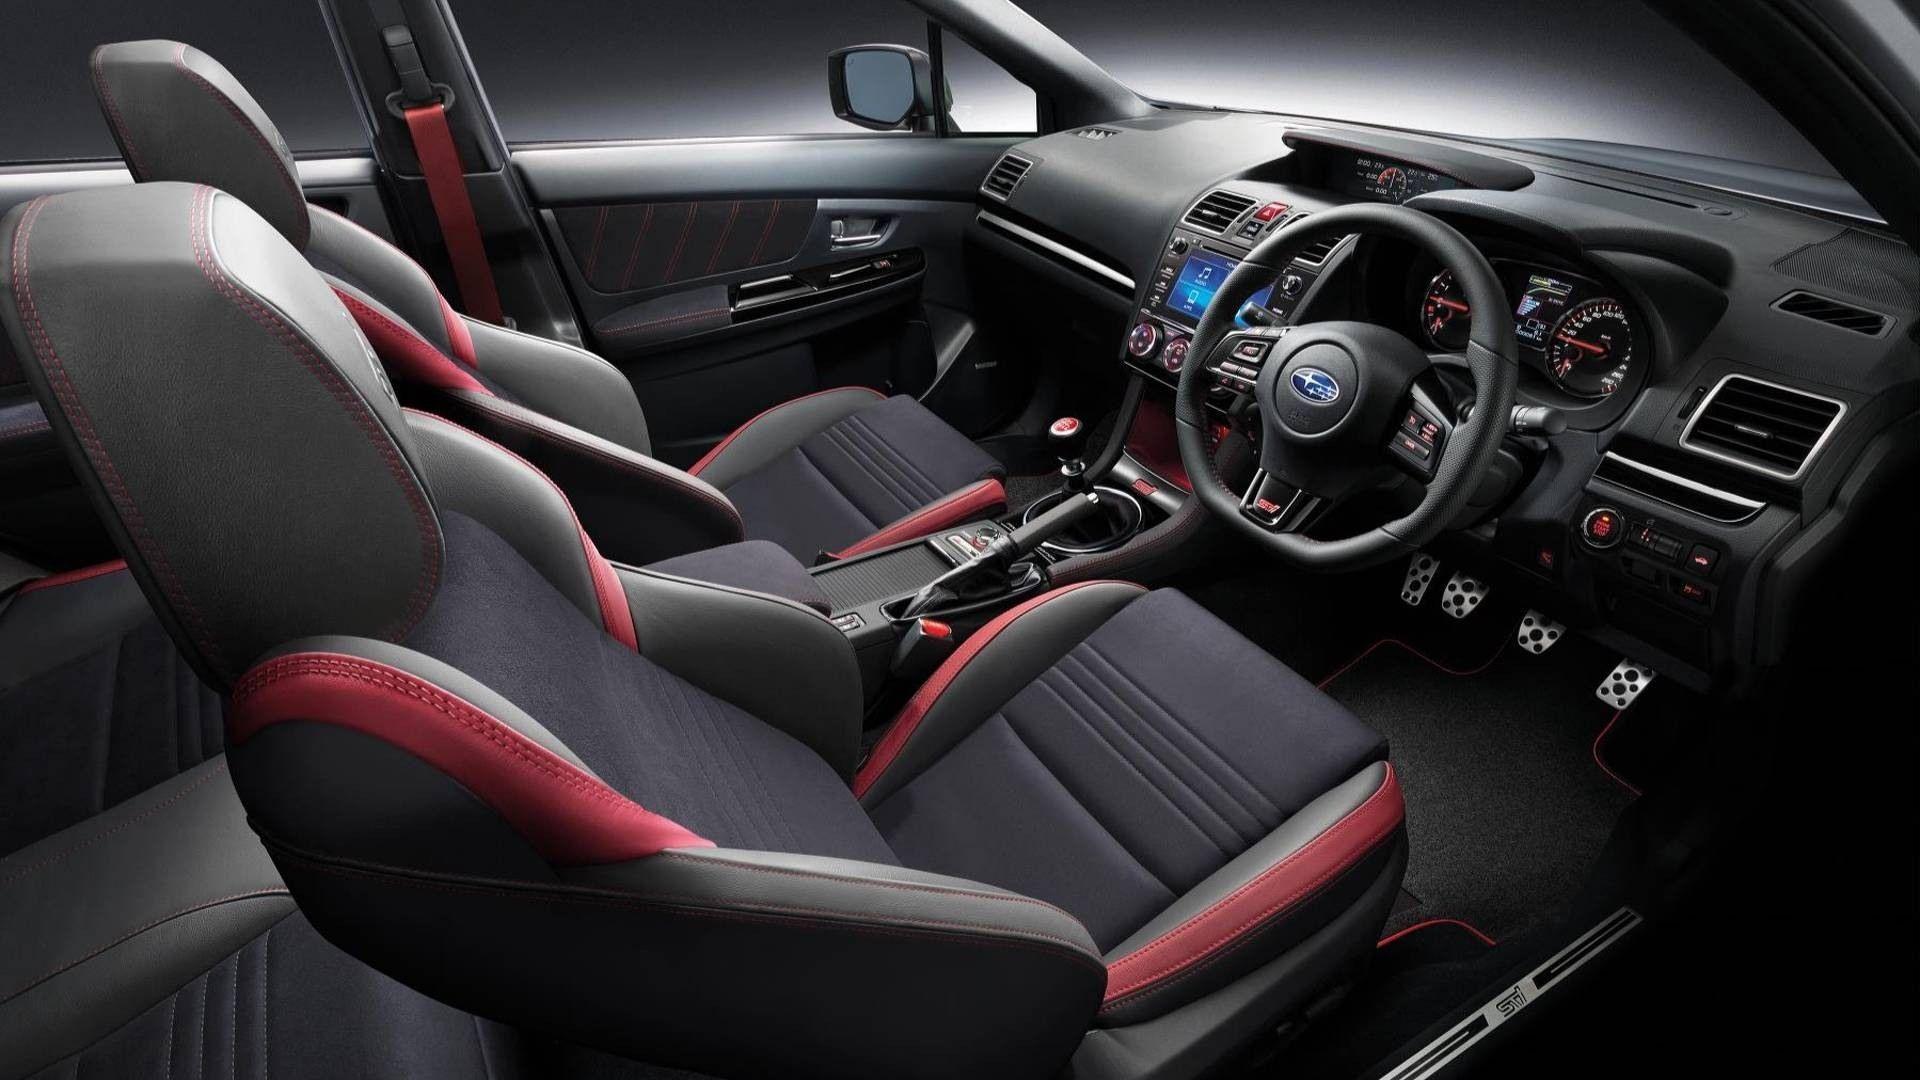 2019 Subaru Horsepower Release Date And Specs